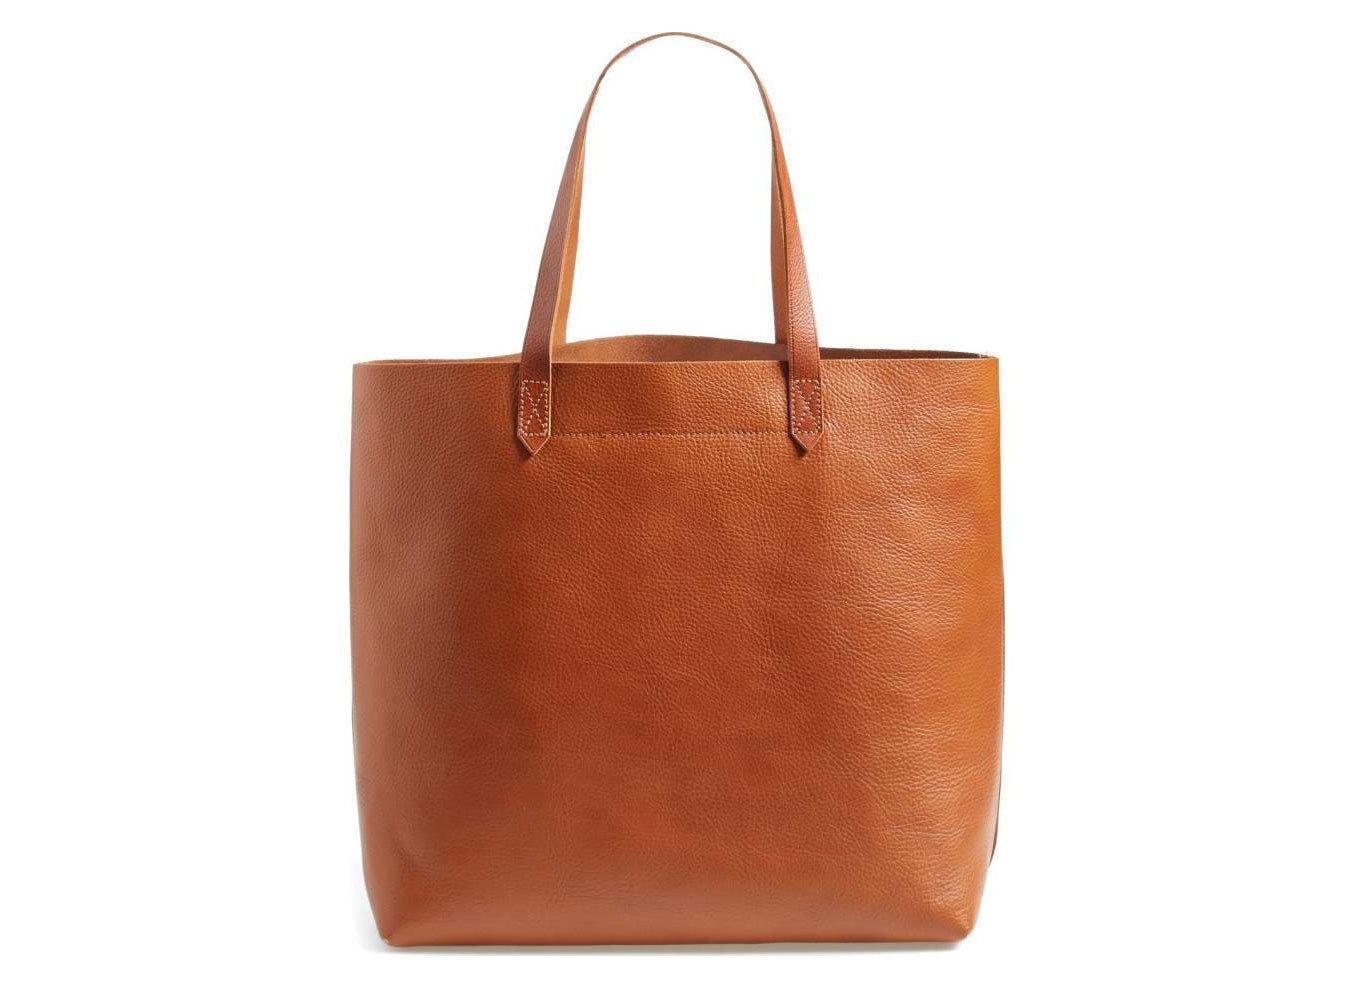 Style + Design Travel Shop accessory case handbag brown bag leather orange shoulder bag caramel color fashion accessory product peach tote bag product design beige brand